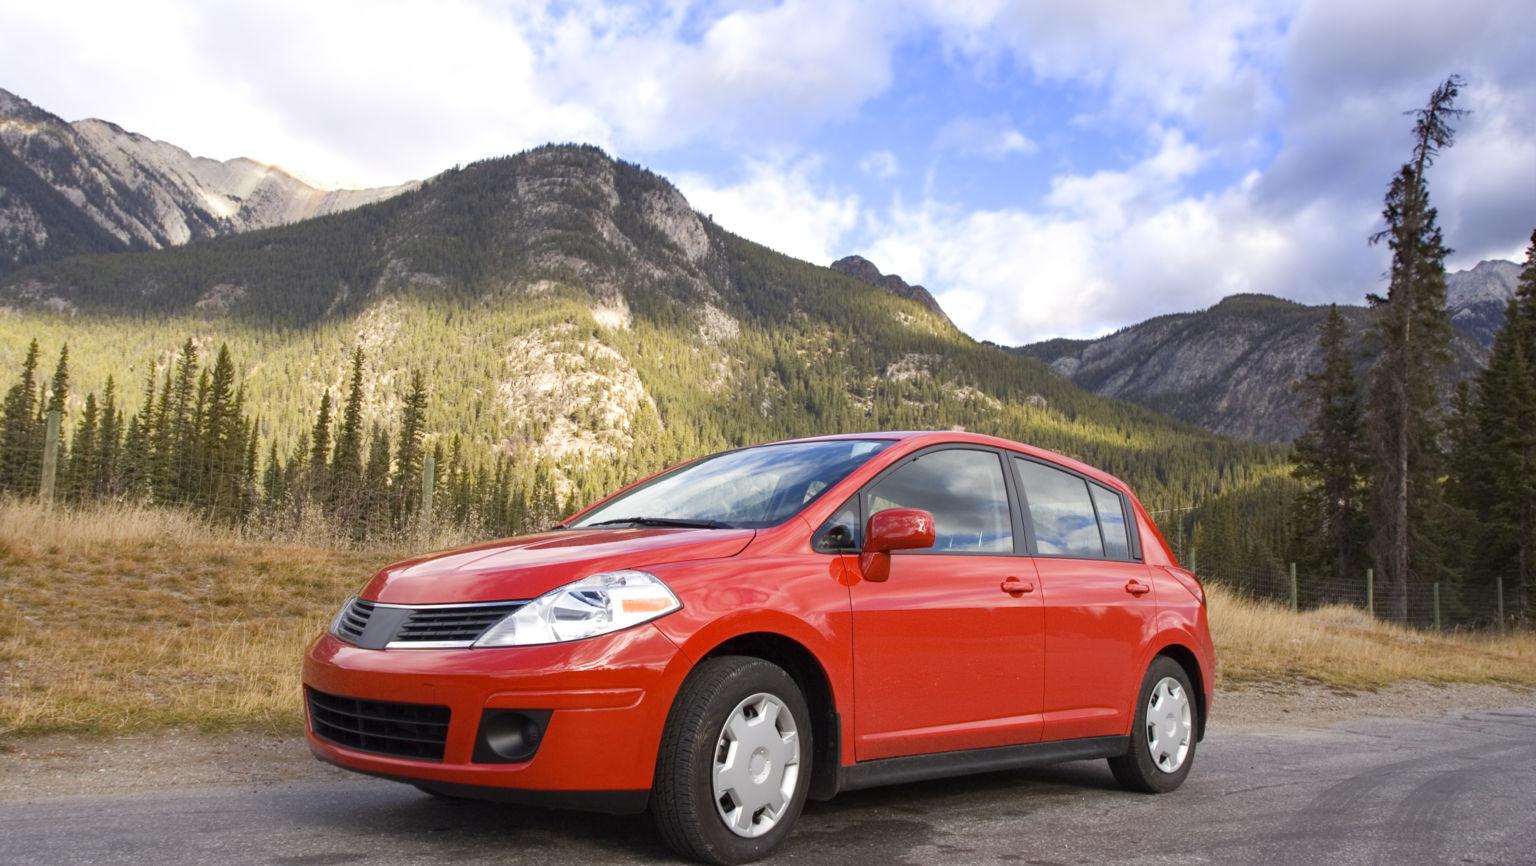 A New Vehicle And Car Rental 8 Better Business Bureau